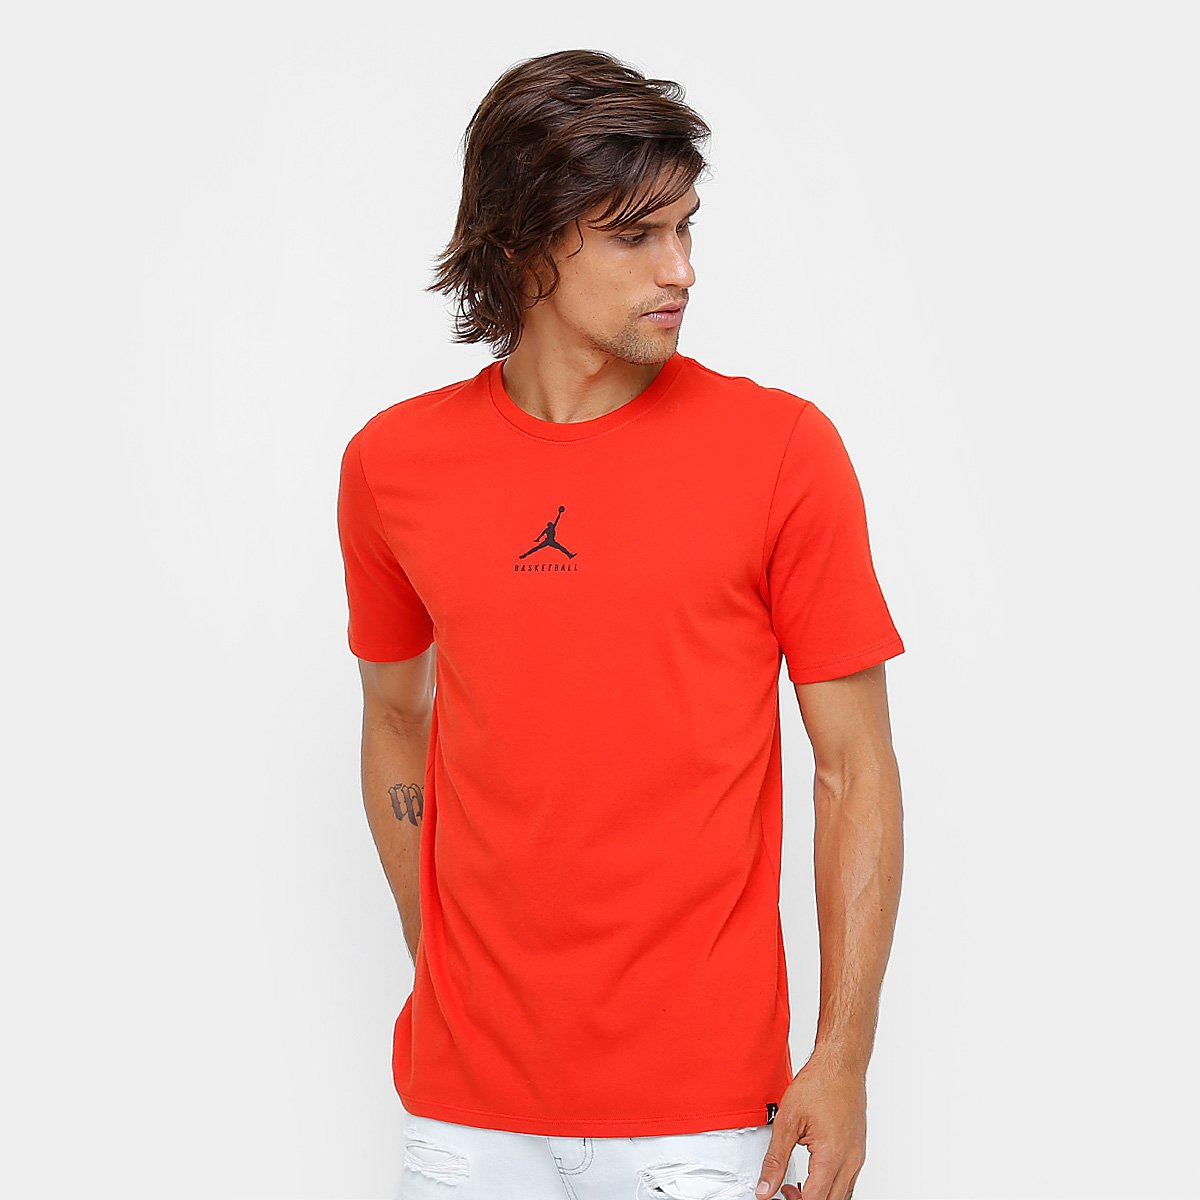 c8fd55ff9d14b Camiseta Jordan Nike NBA JBSK 23 7 Masculina - Compre Agora